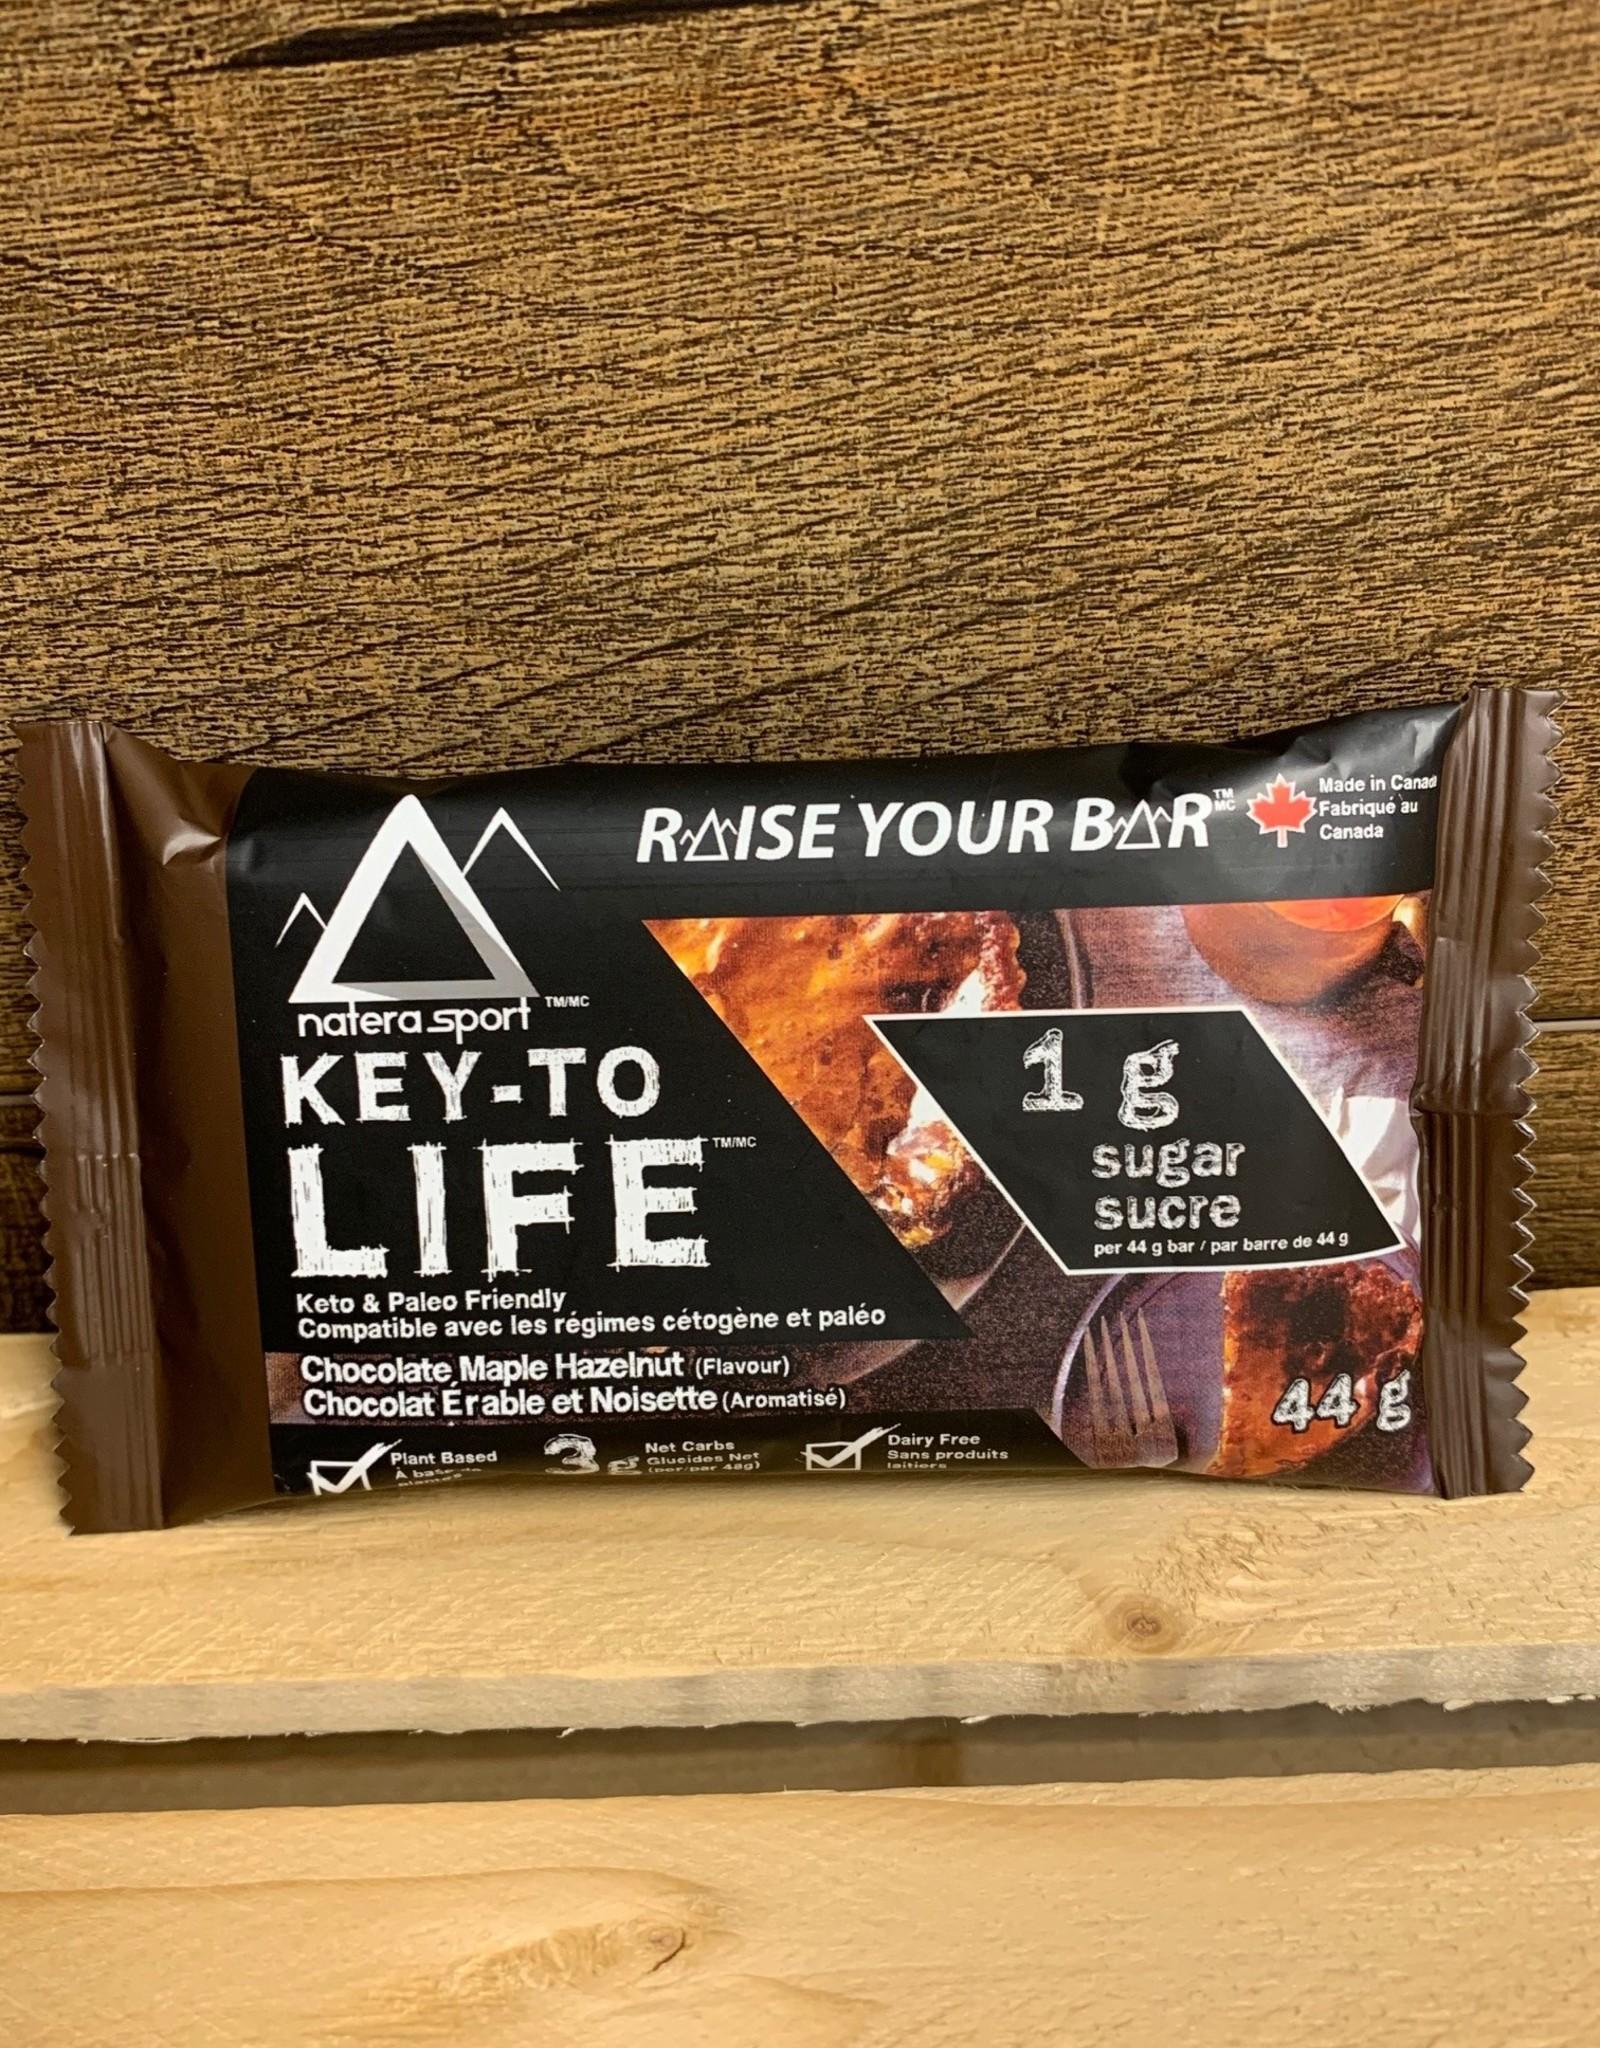 Key-To Life, Keto Bar, Chocolate Maple Hazelnut